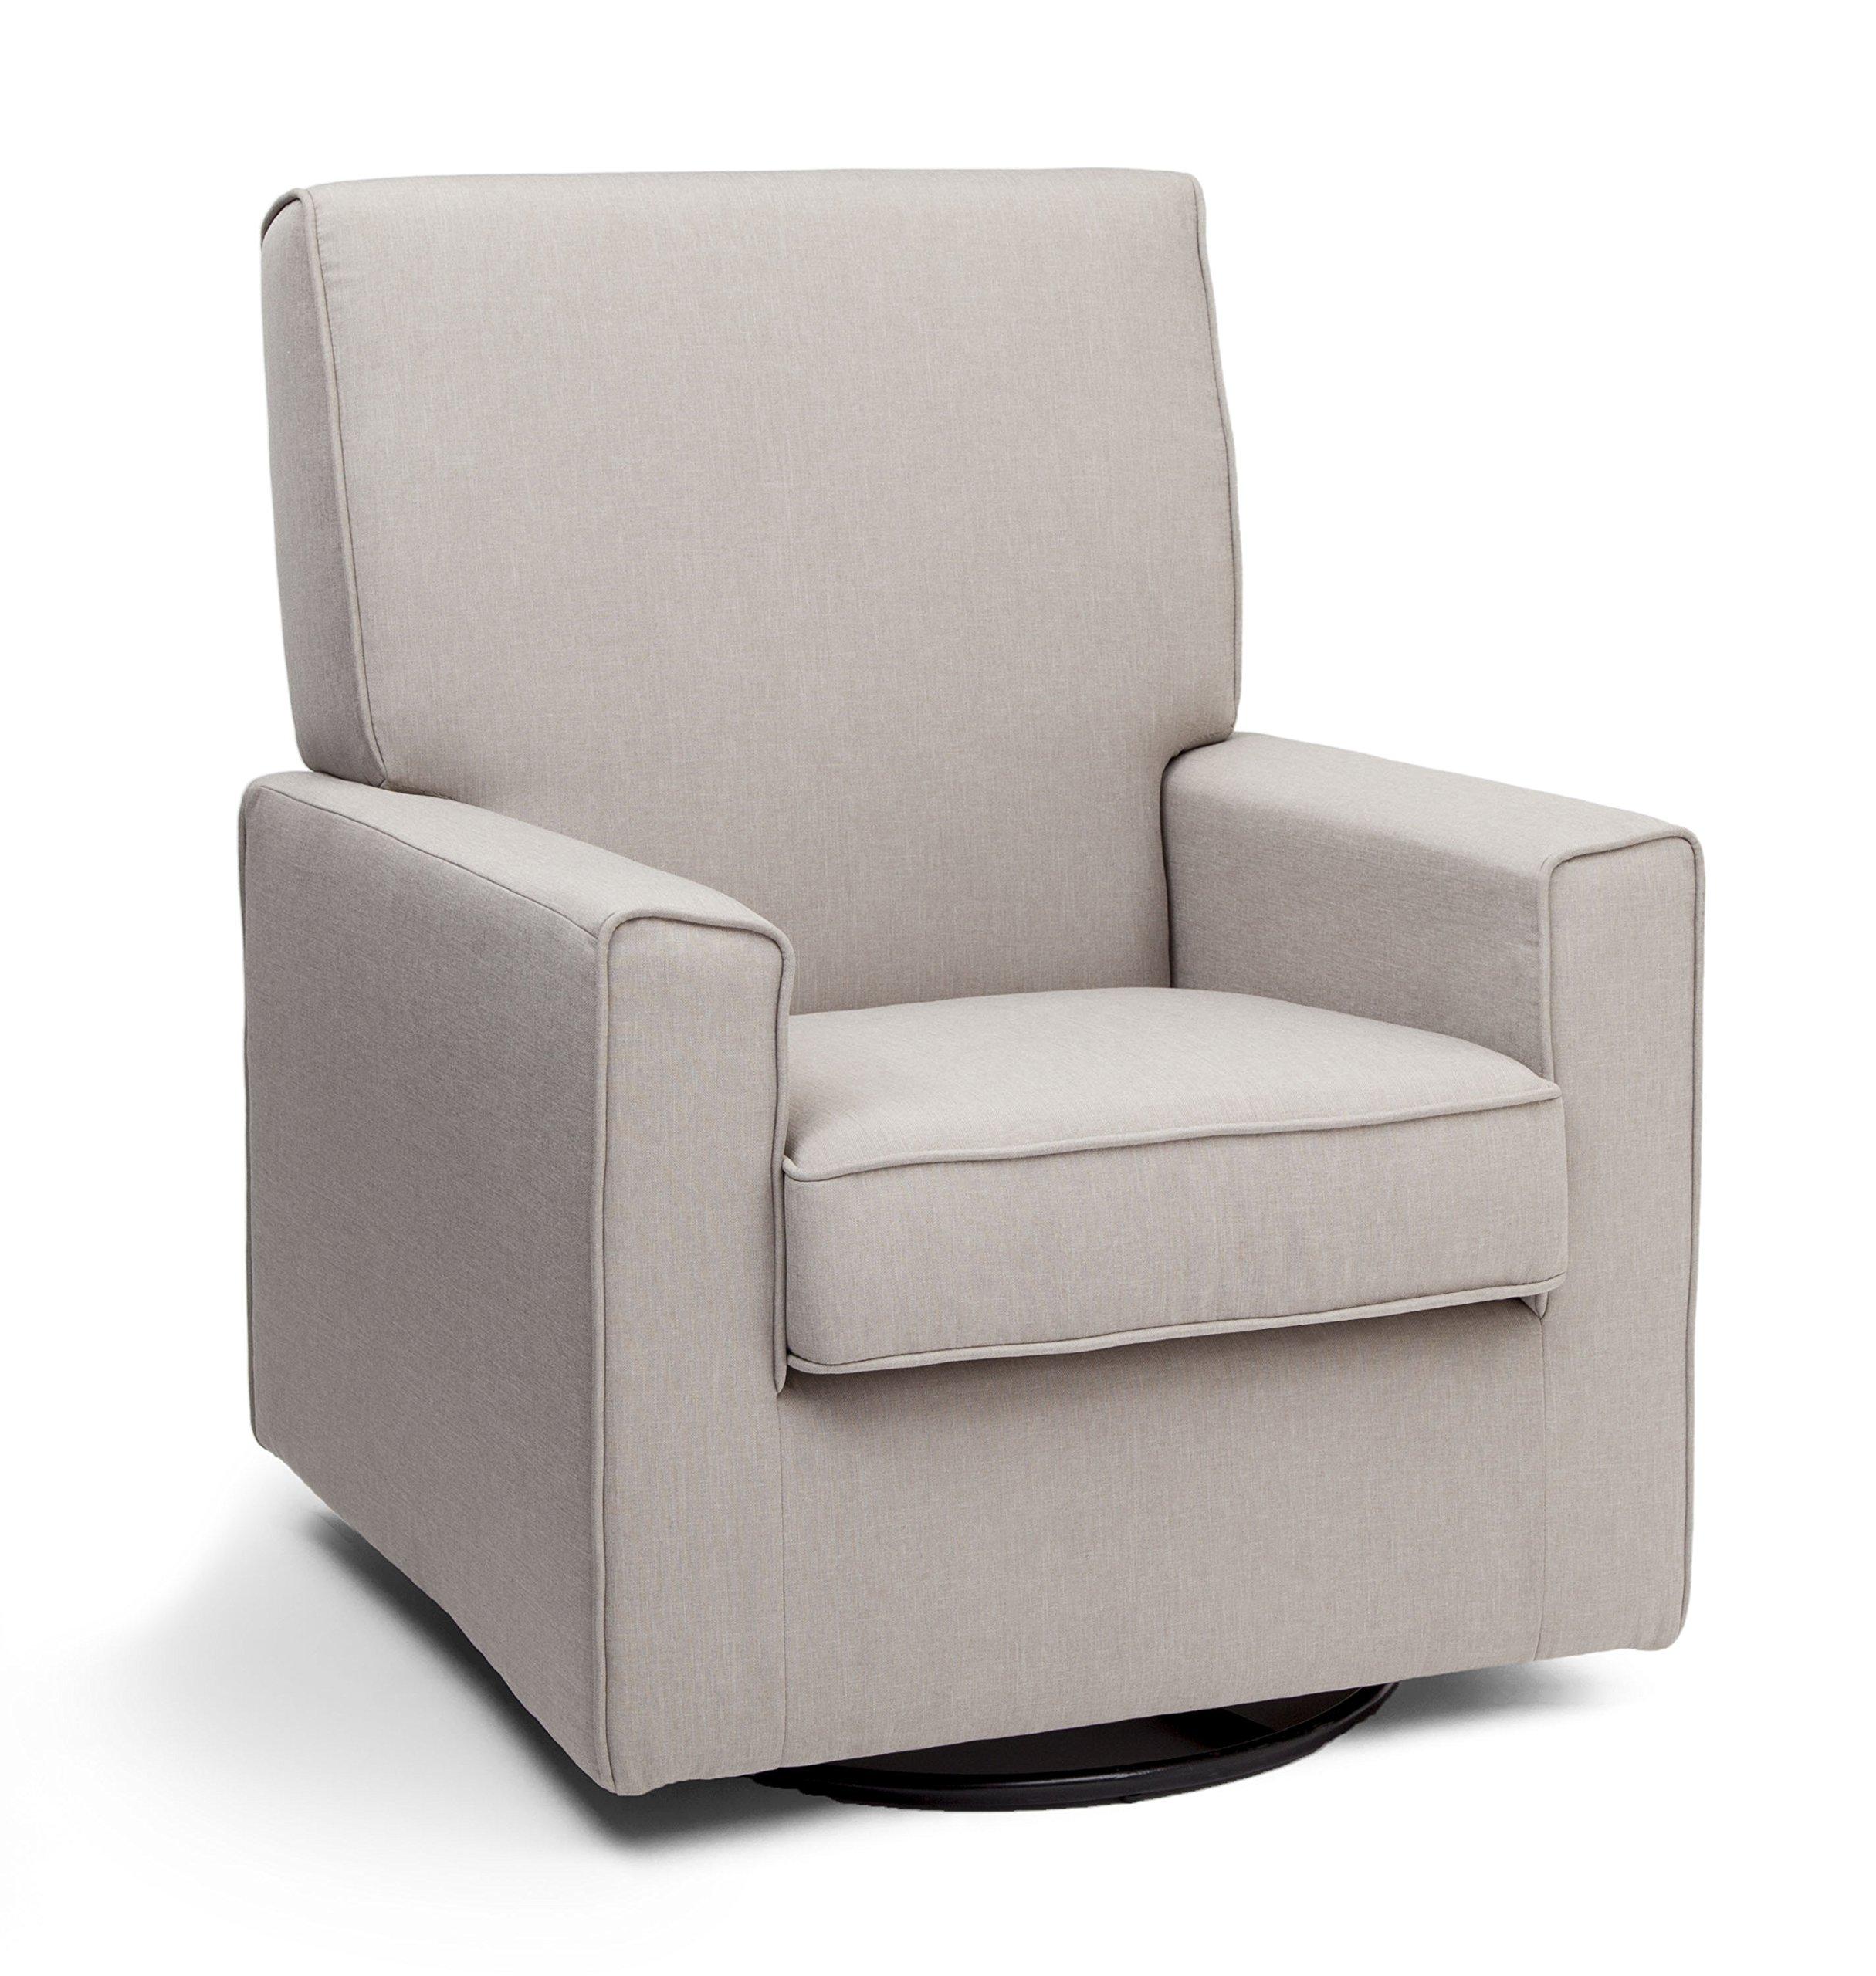 Delta Furniture Eva Upholstered Glider Swivel Rocker Chair, Taupe